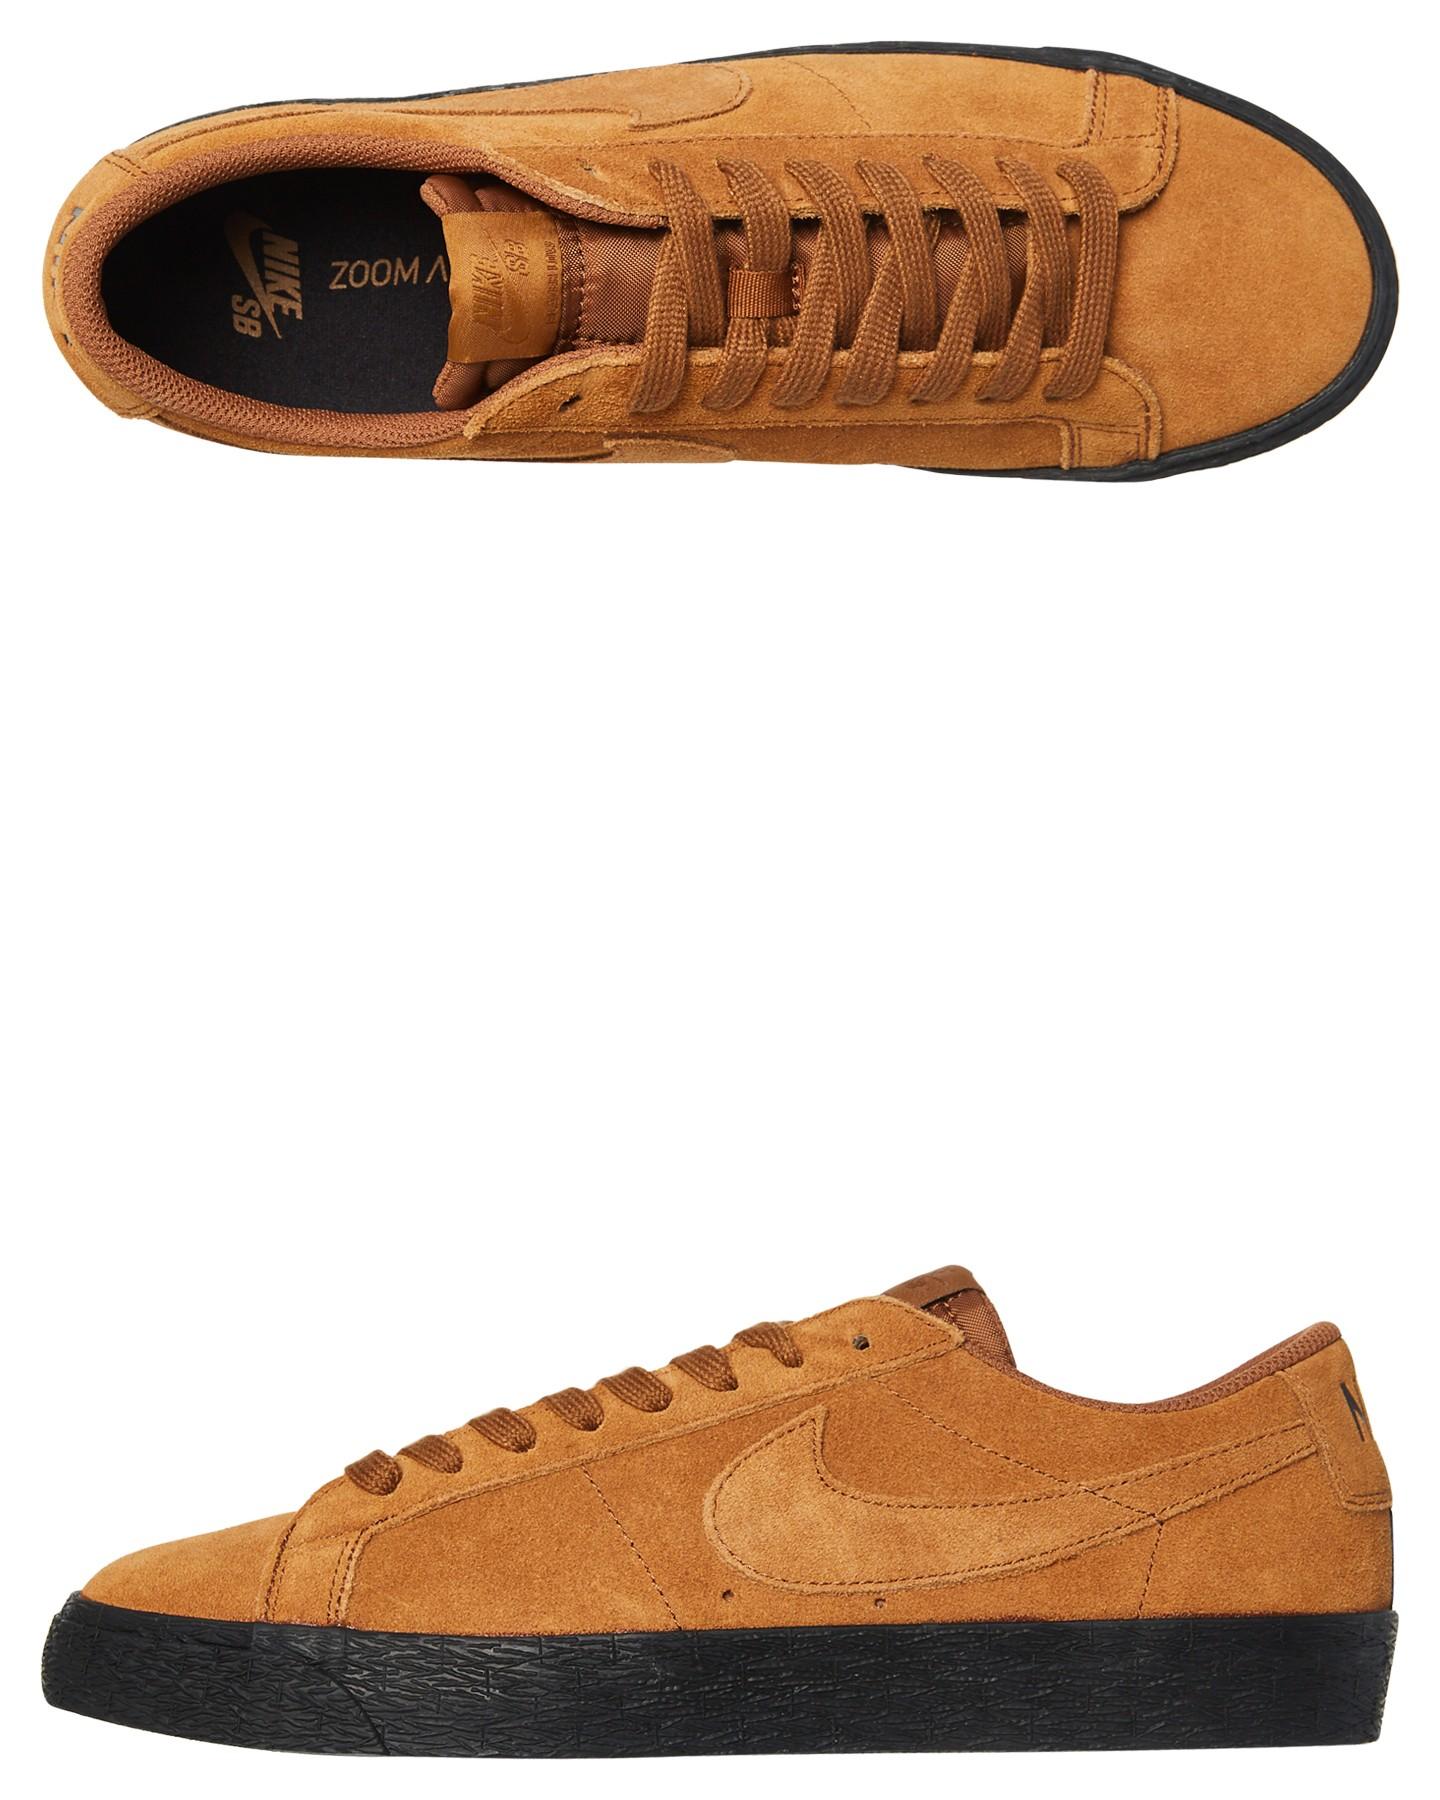 Nike SB Zoom Blazer Low Lt British Tan Lt British Tan | Footshop